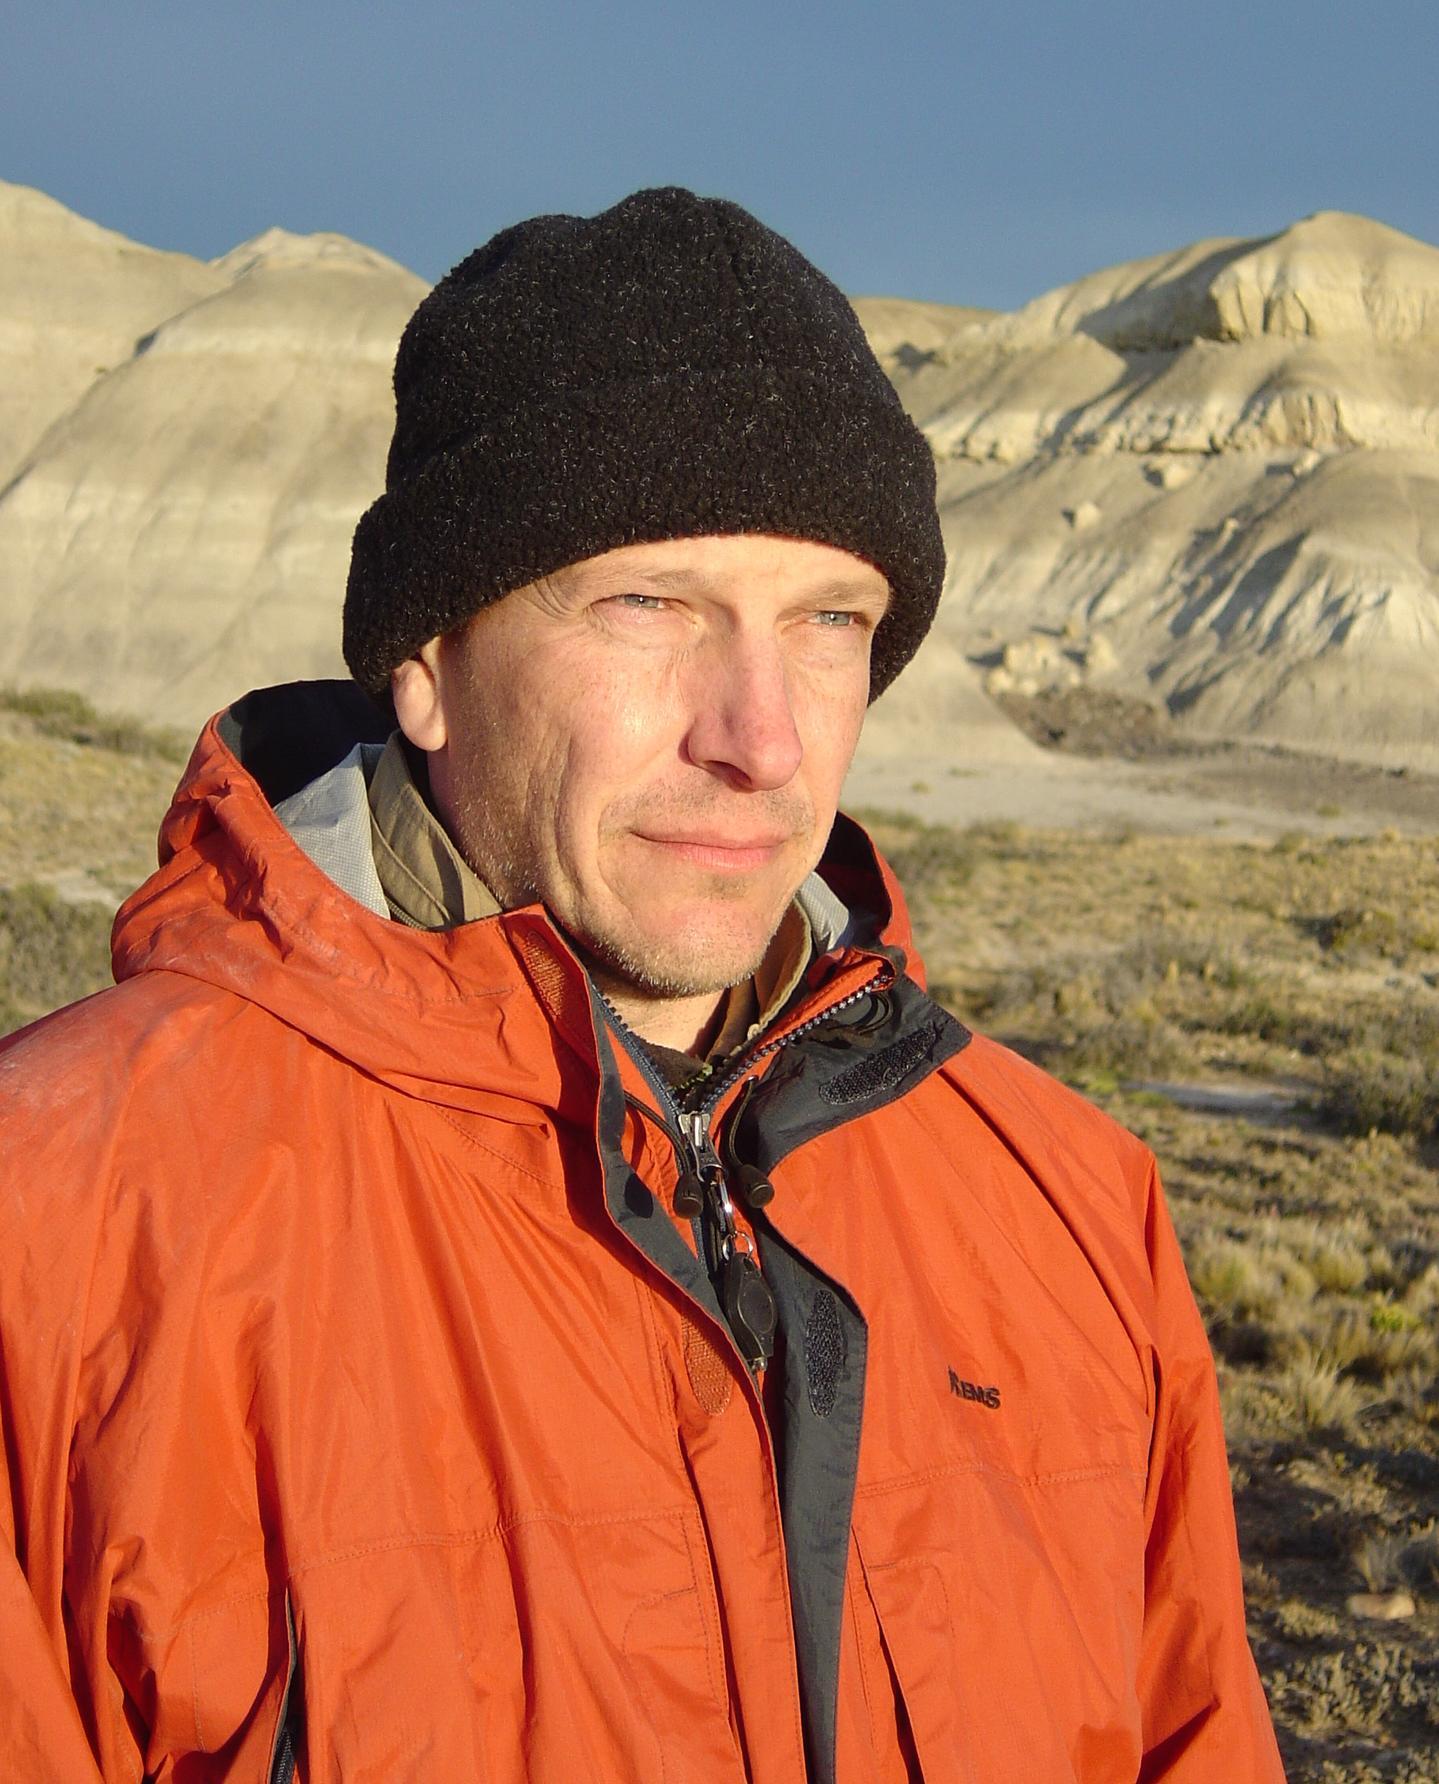 TED Book author: Kenneth Lacovara